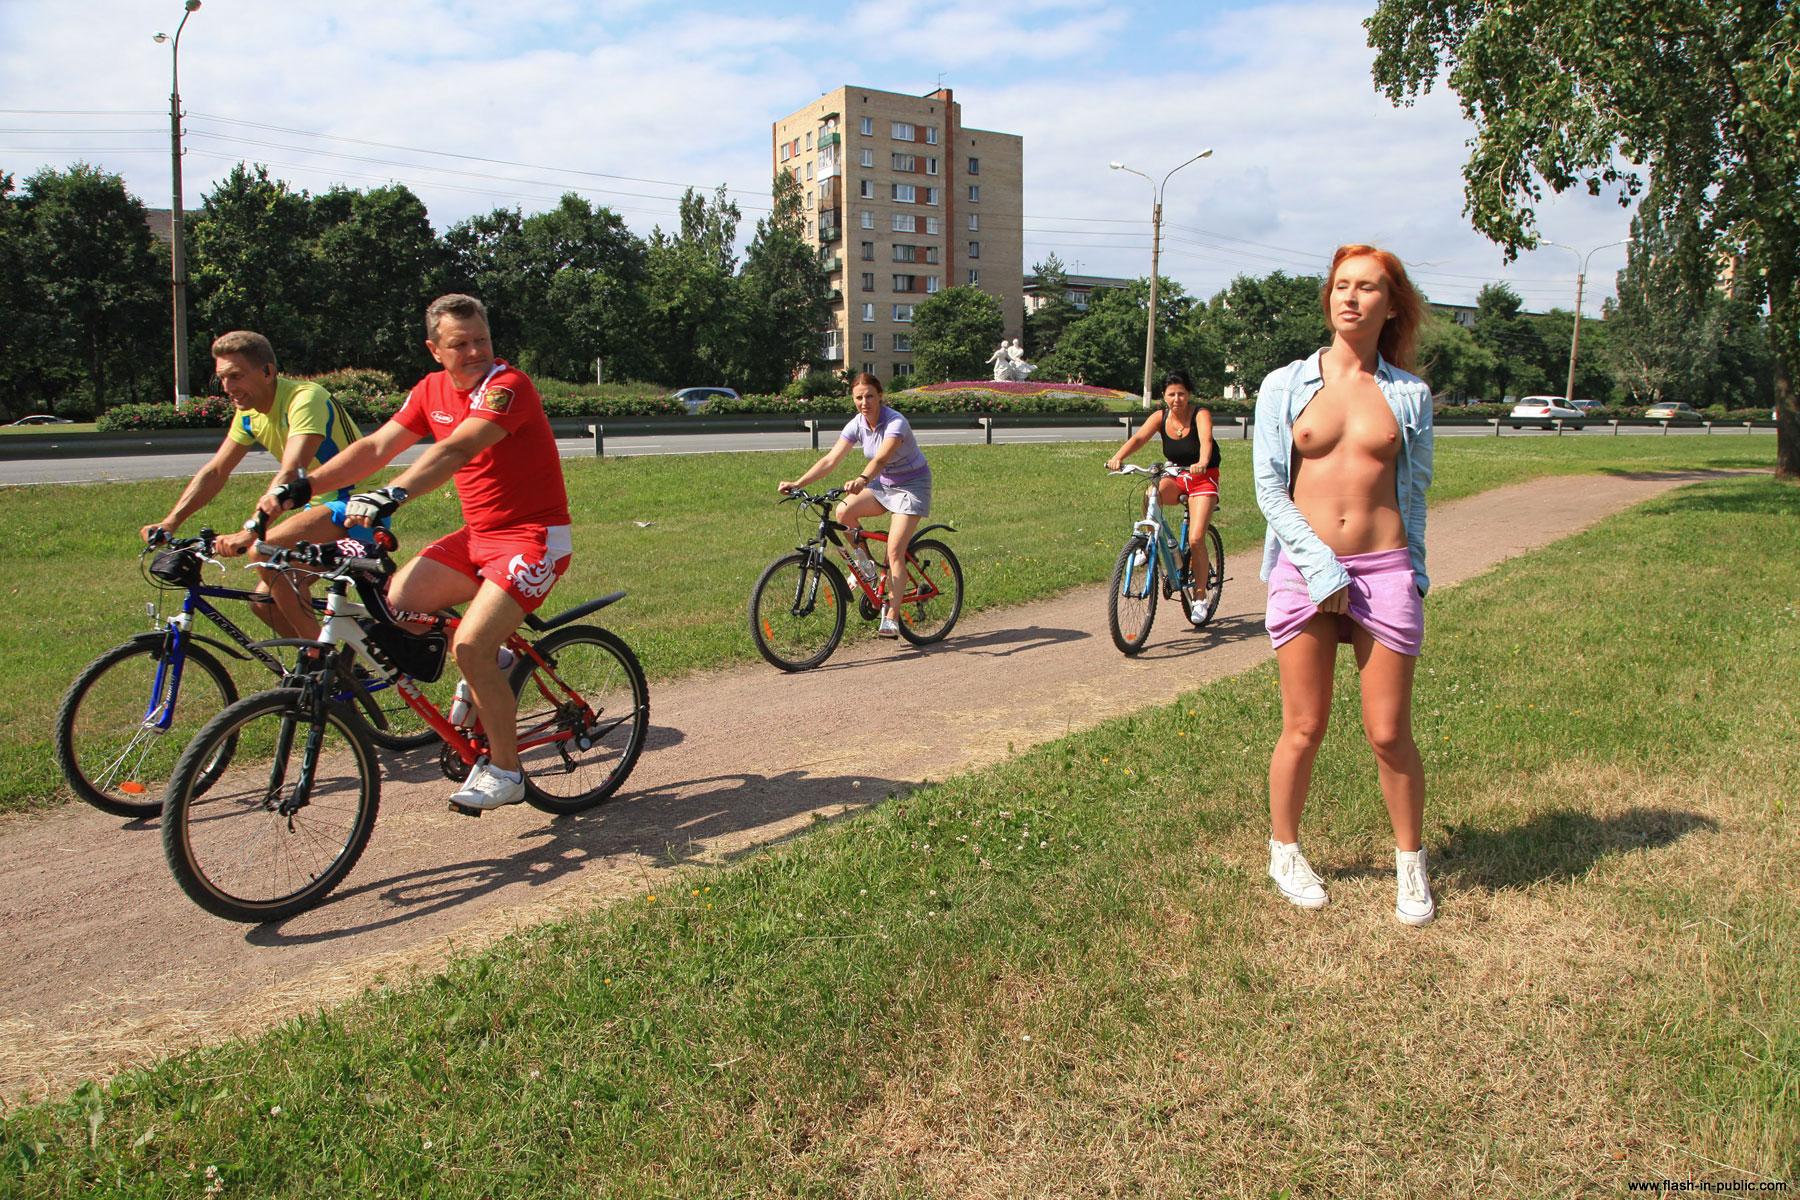 margarita-s-redhead-nude-park-small-tits-flash-in-public-08